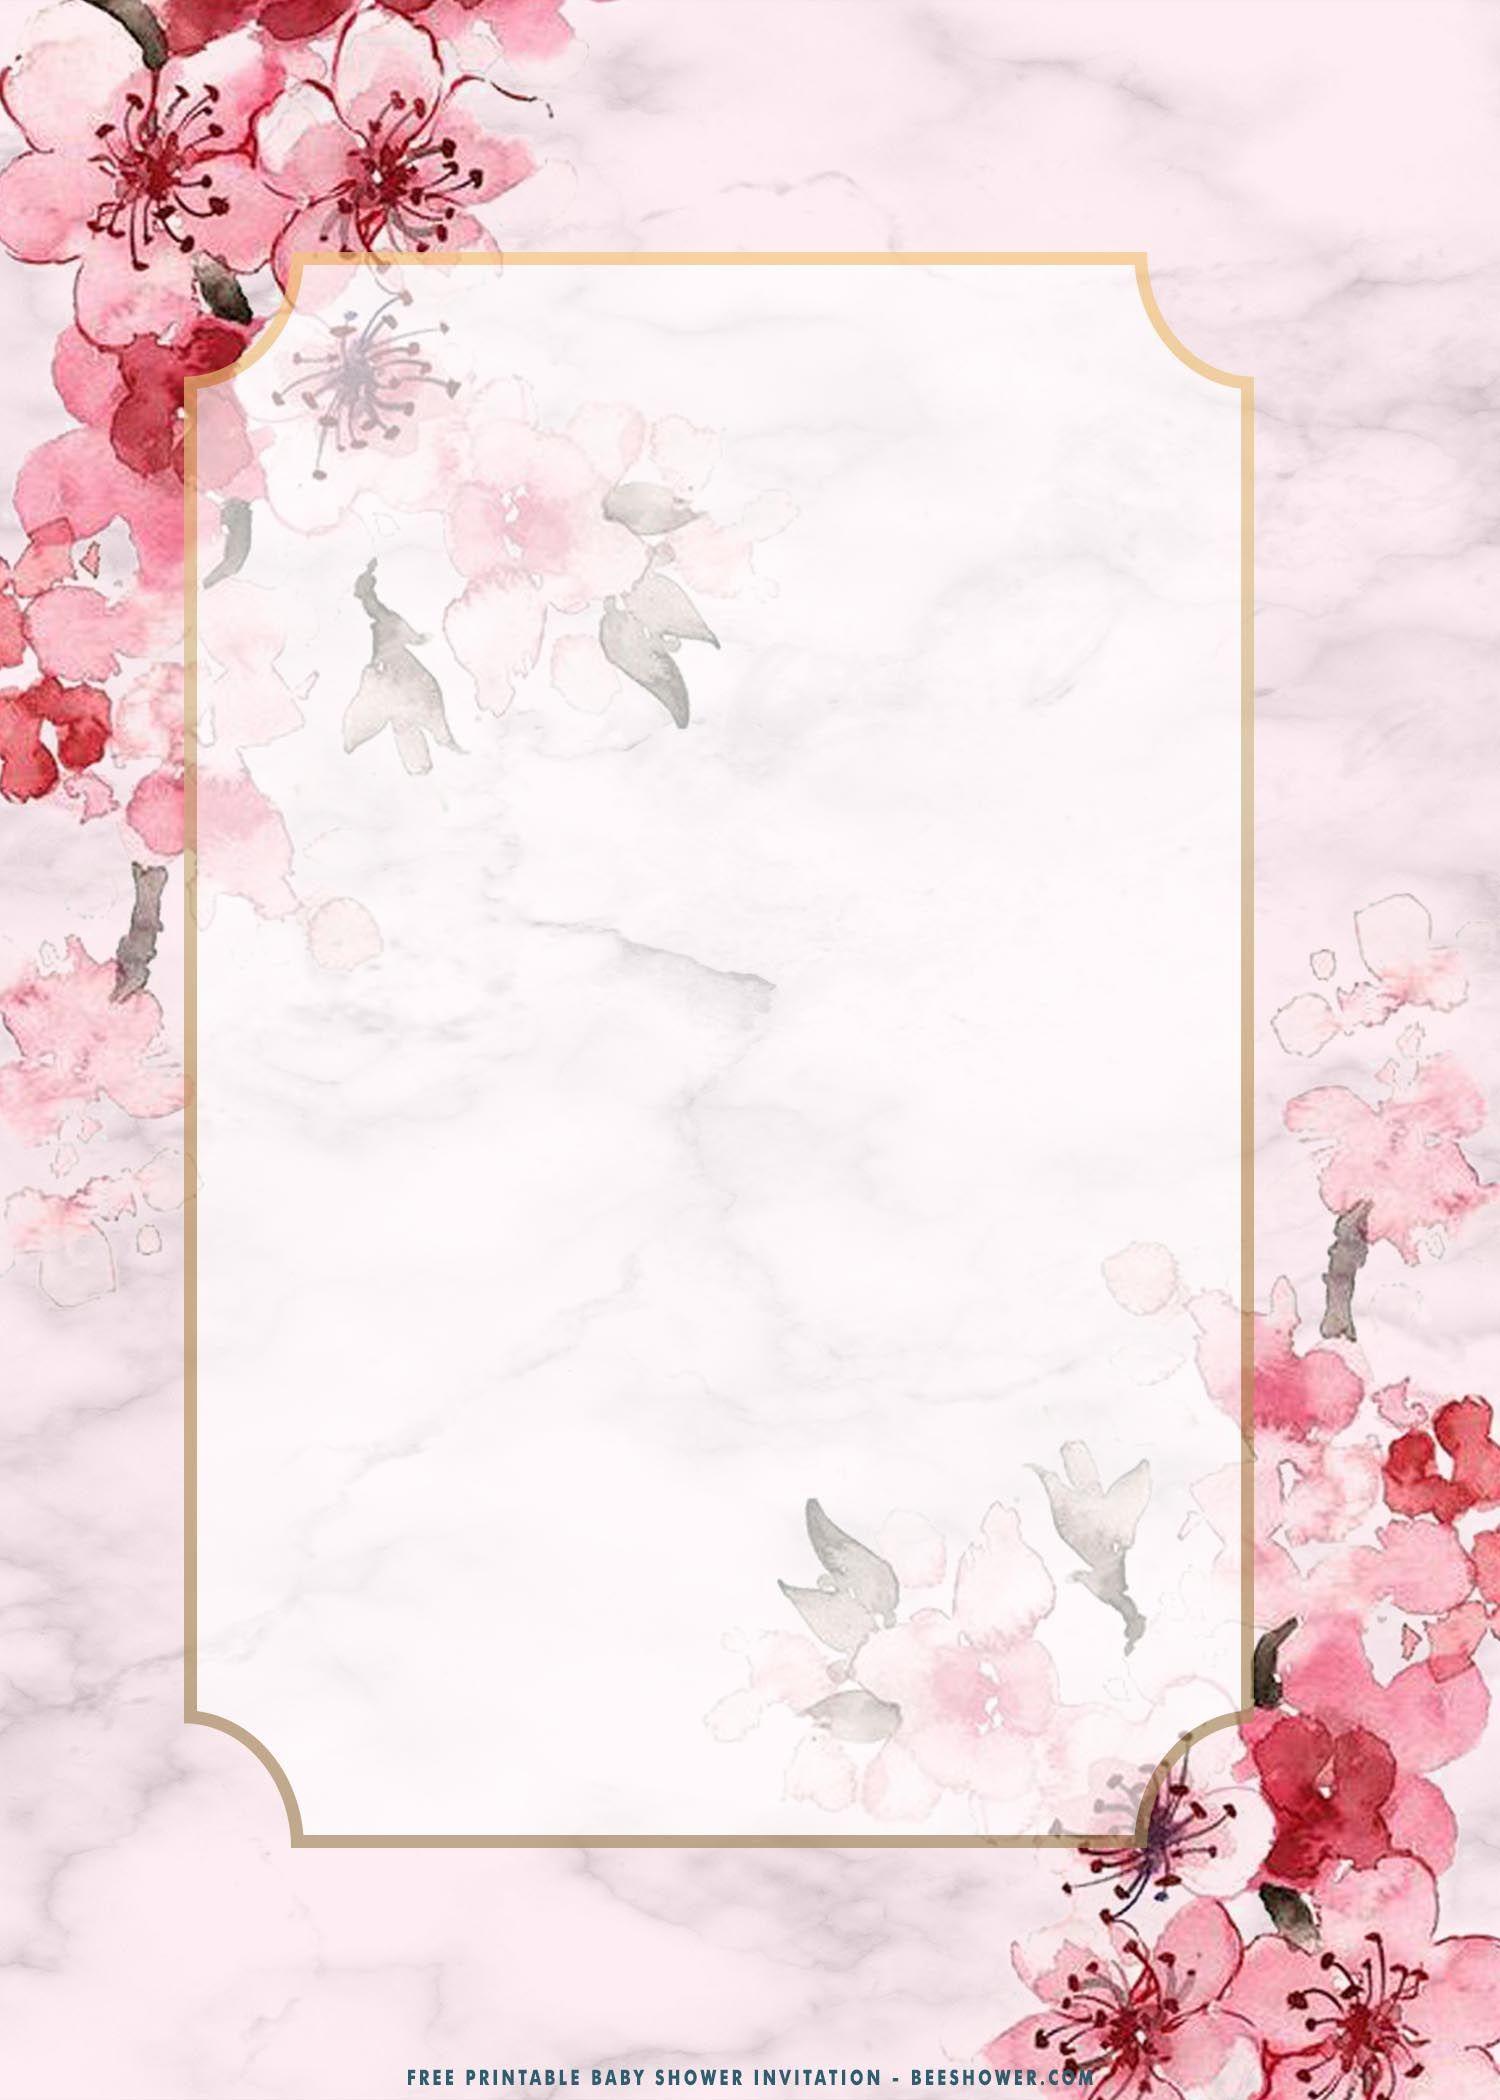 (FREE Printable) – Blush Pink Sakura Baby Shower Invitation Templates | Beeshower